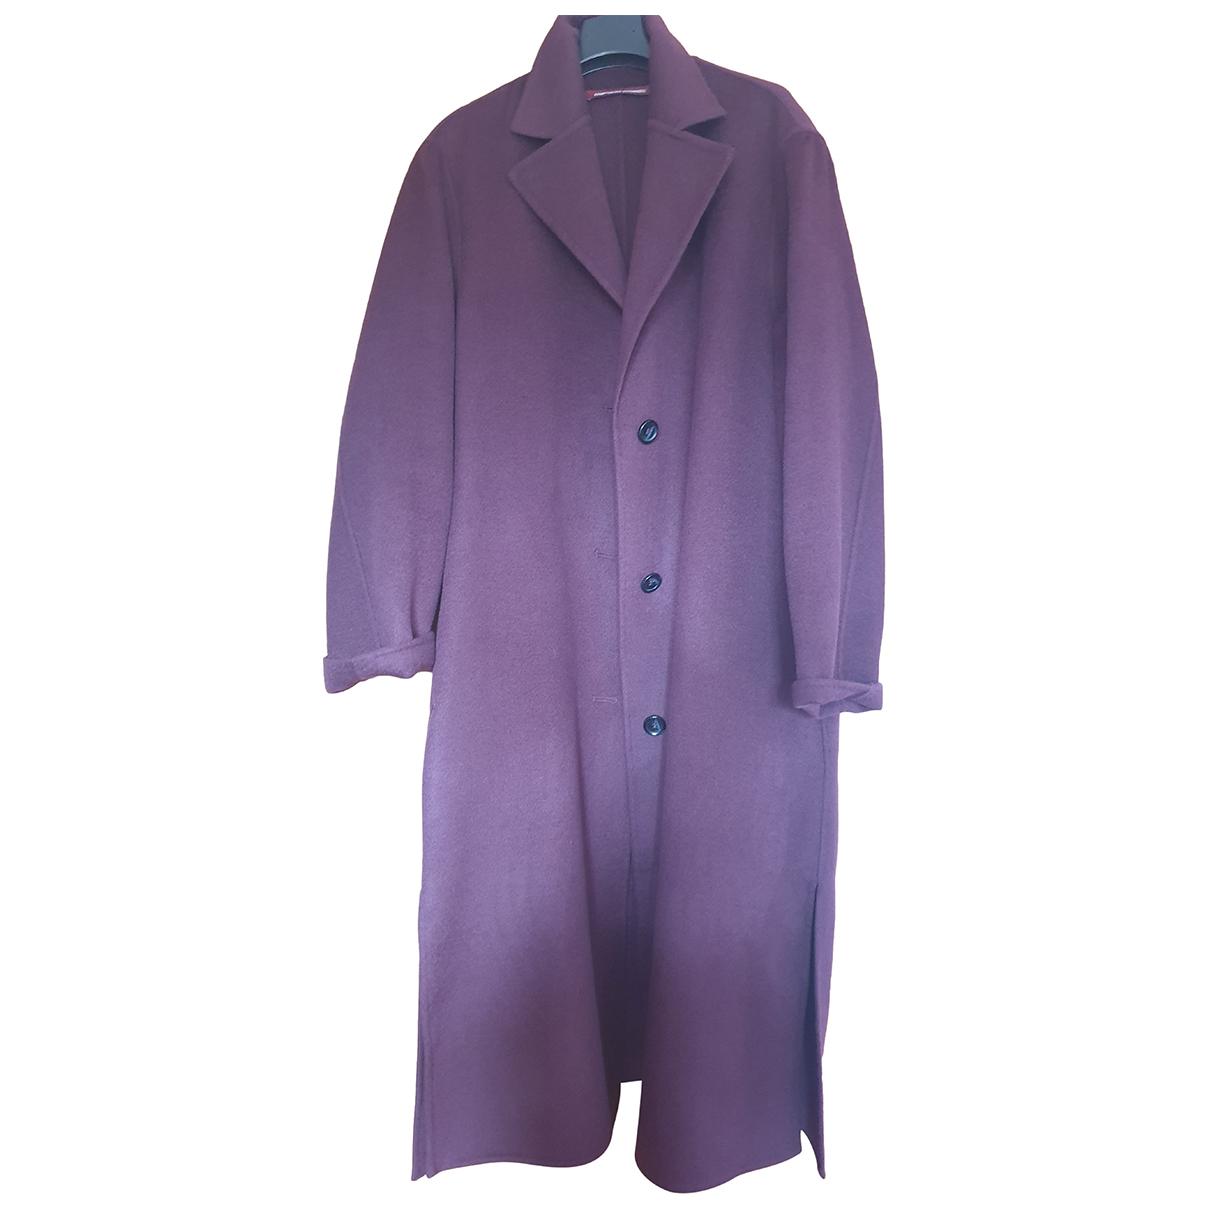 Comptoir Des Cotonniers N Wool coat for Women 36 FR